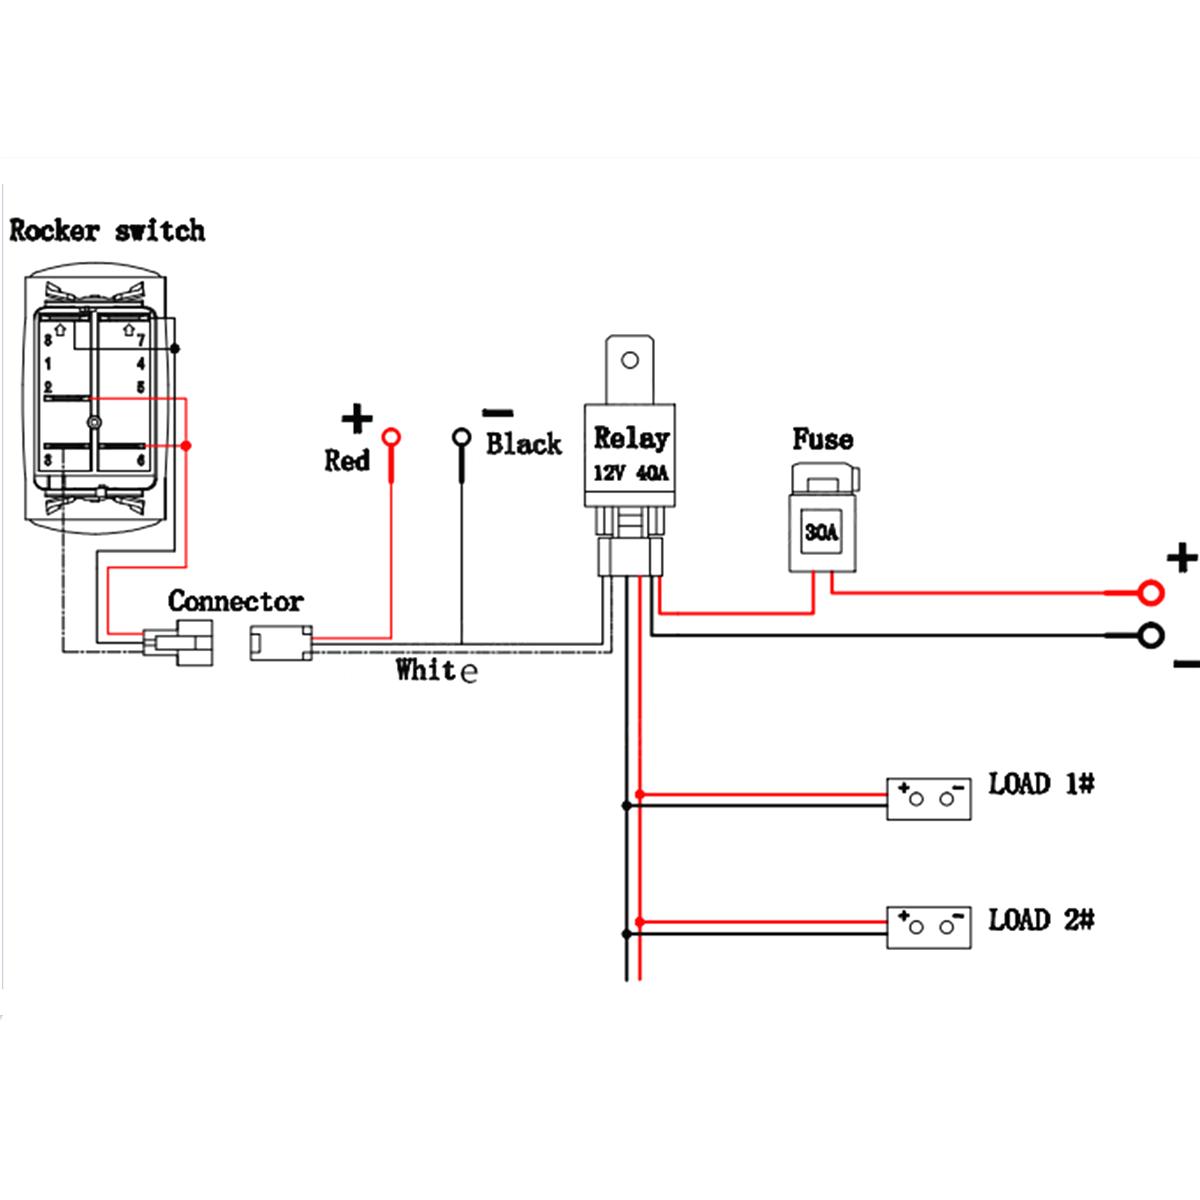 anc relay wiring diagram